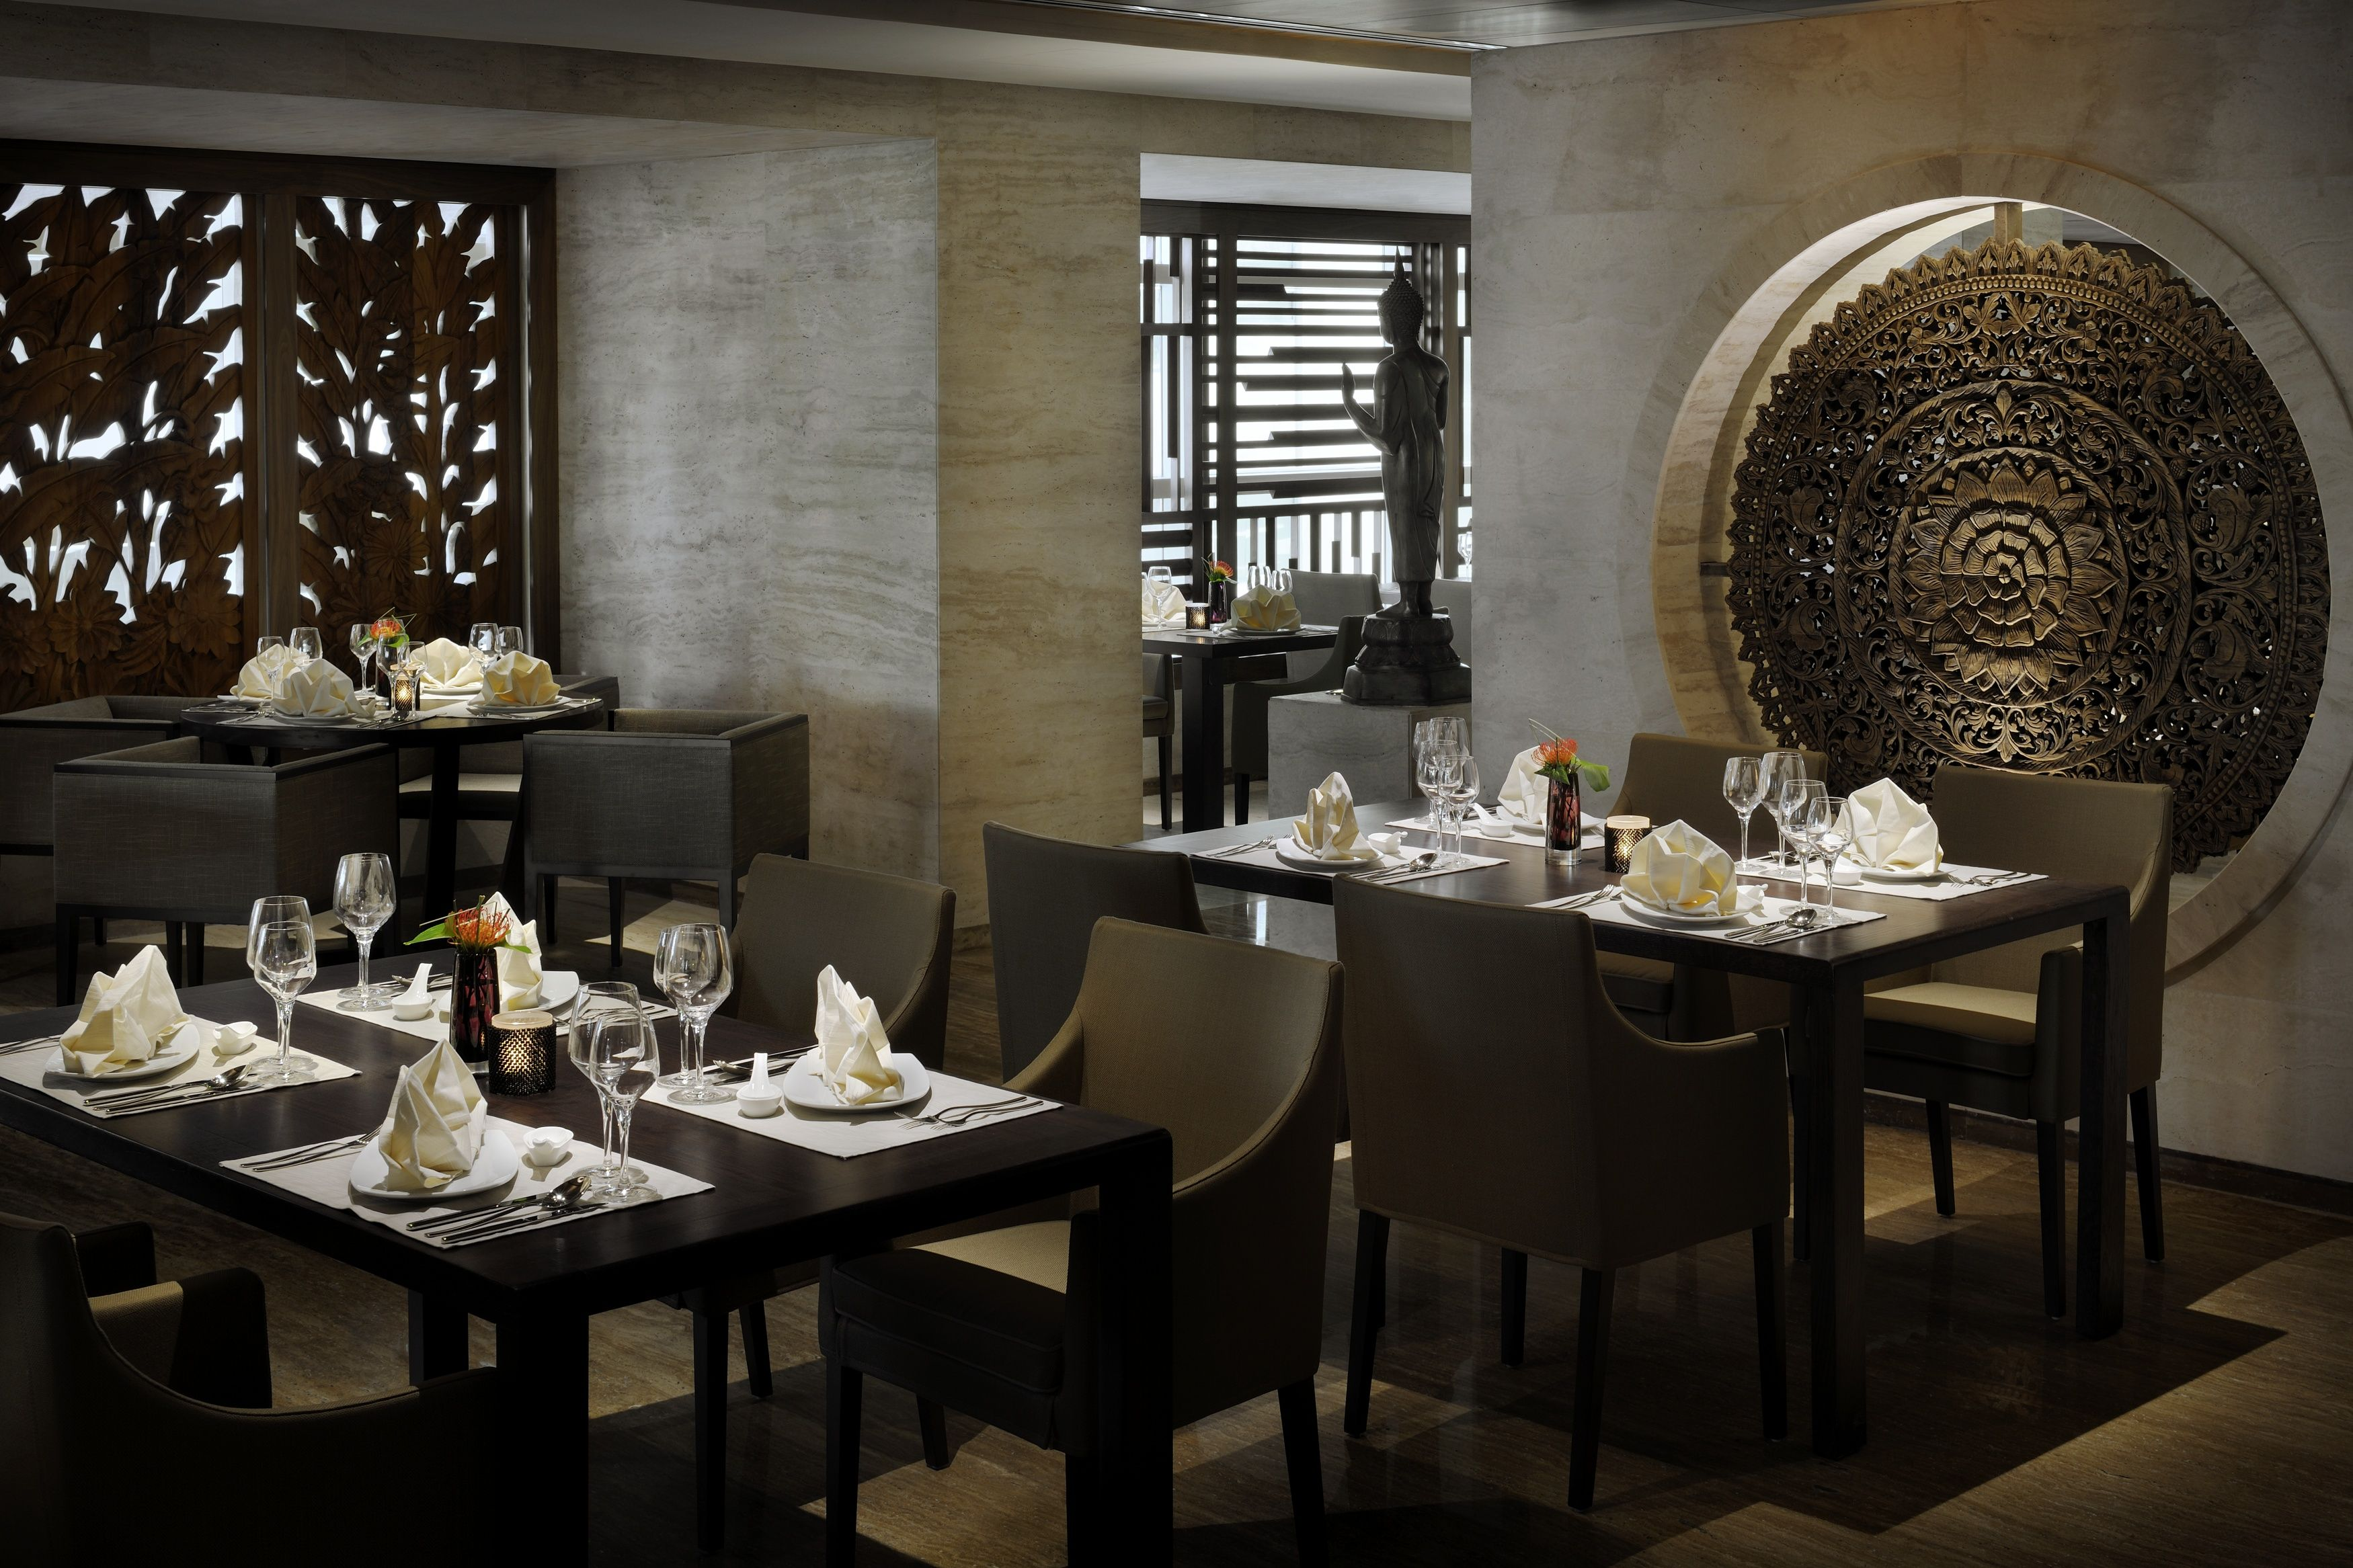 Indo Thai Restaurant  Restaurants Designeddlg  Pinterest Stunning Park Hyatt Sydney Dining Room Design Inspiration